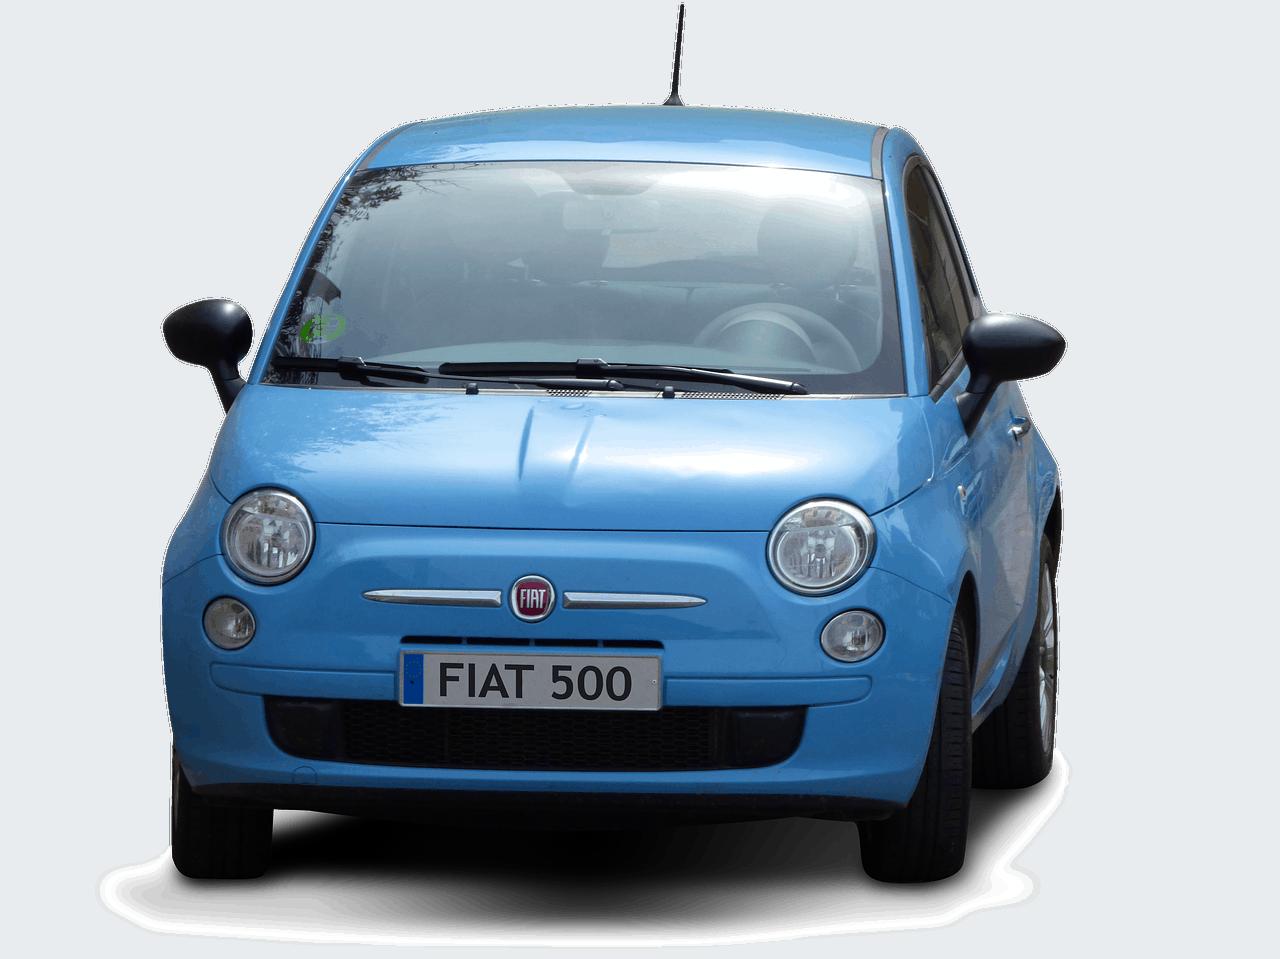 Changer embrayage Fiat 500